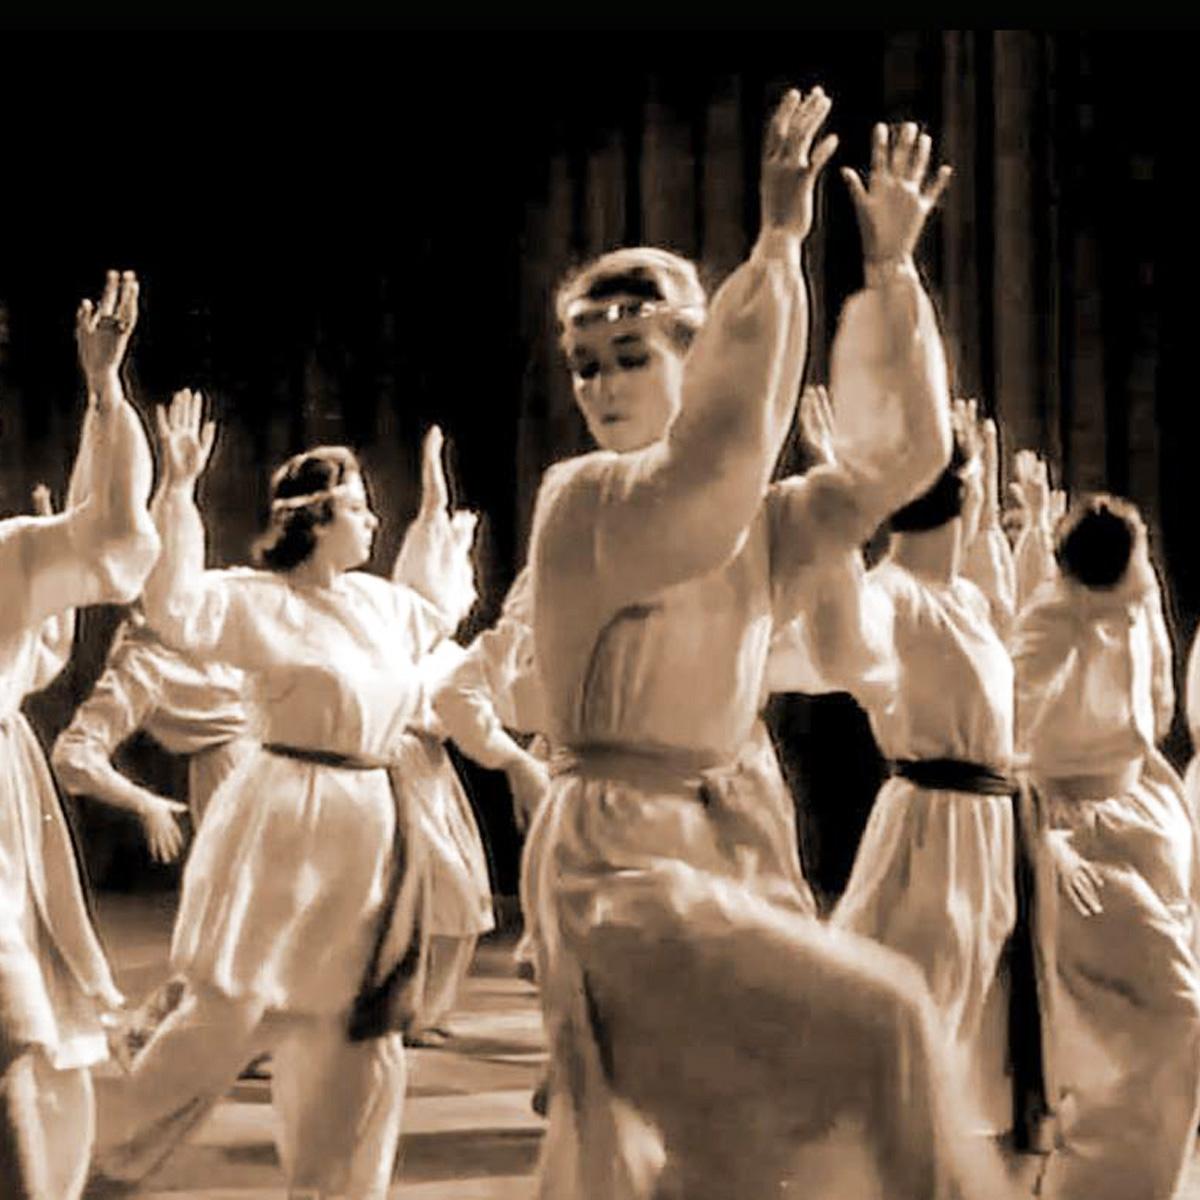 maestro-di-danze-intervista-Josée-de-Salzmann